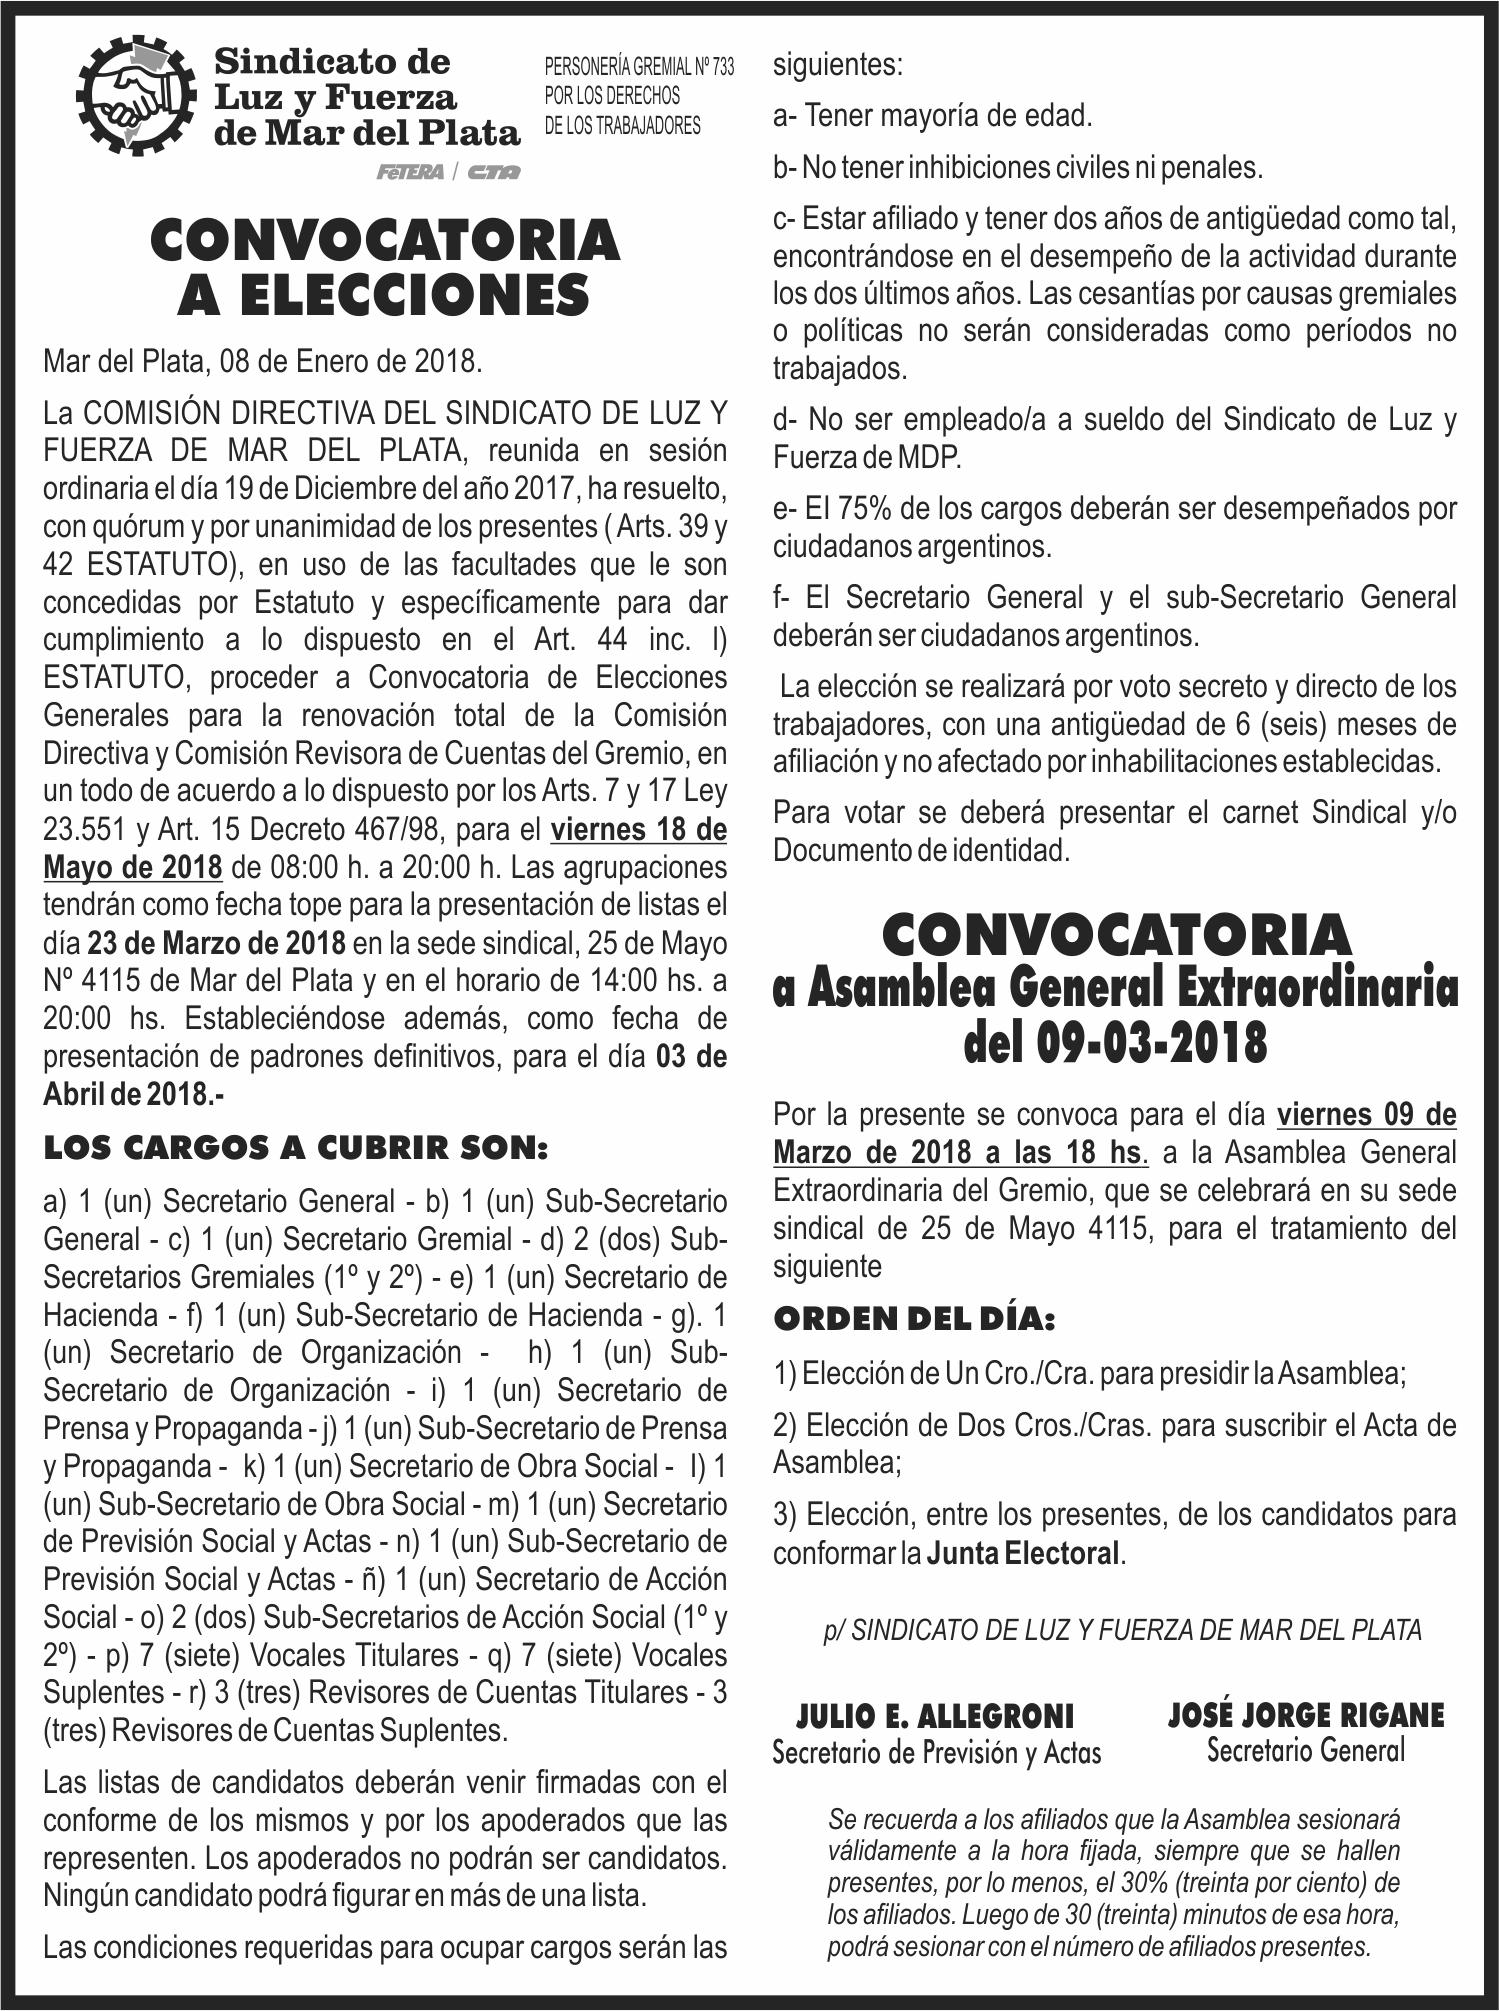 CONVOCATORIA A ELECCIONES 2018